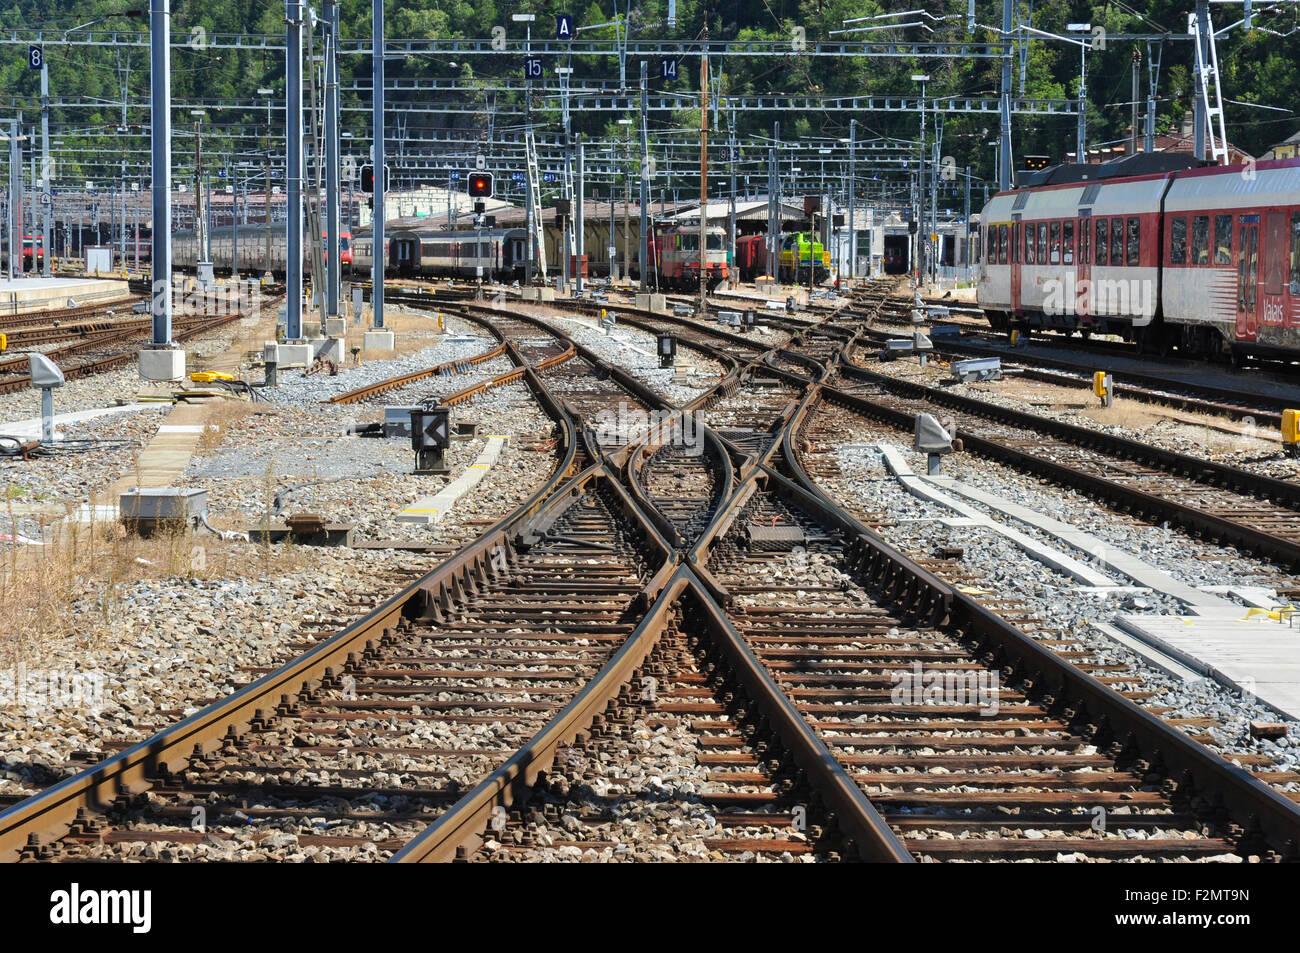 Doppelte Slip Kreuzung am Bahnhof Konstruktionen am Bahnhof Brig, Wallis, Schweiz Stockbild